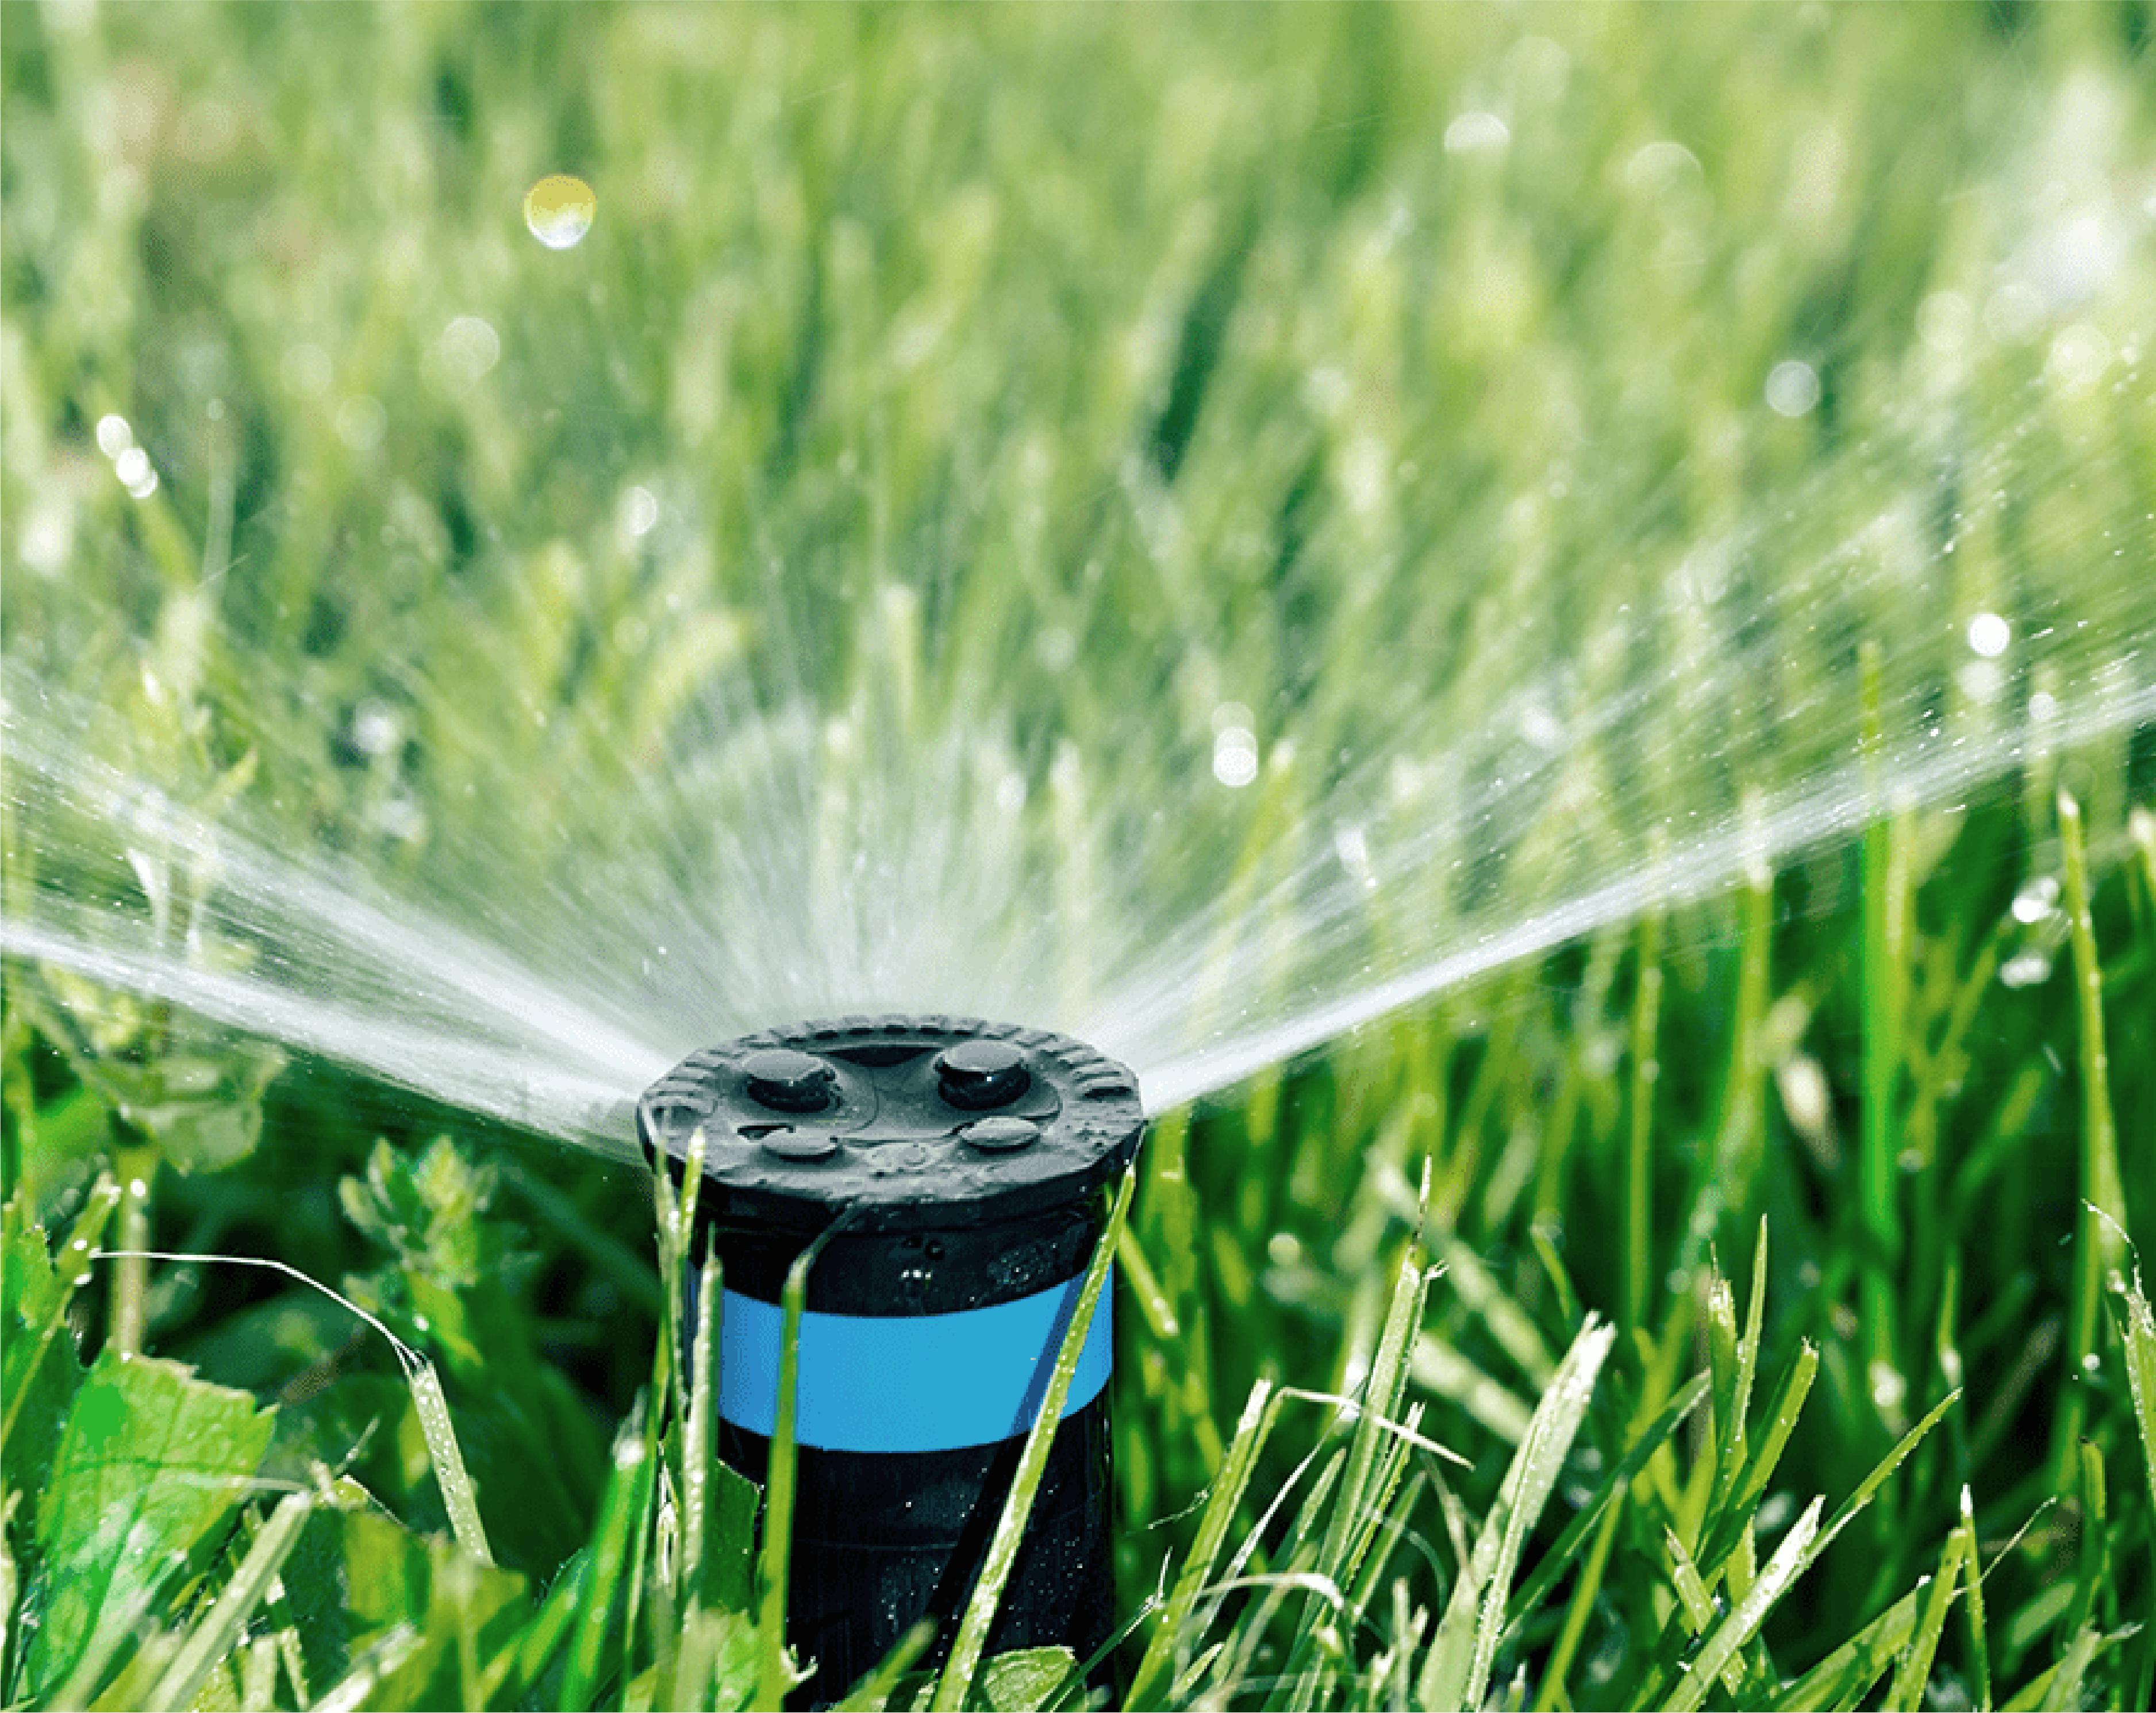 Sprinkler Nozzle Rebates from SoCal Water$mart